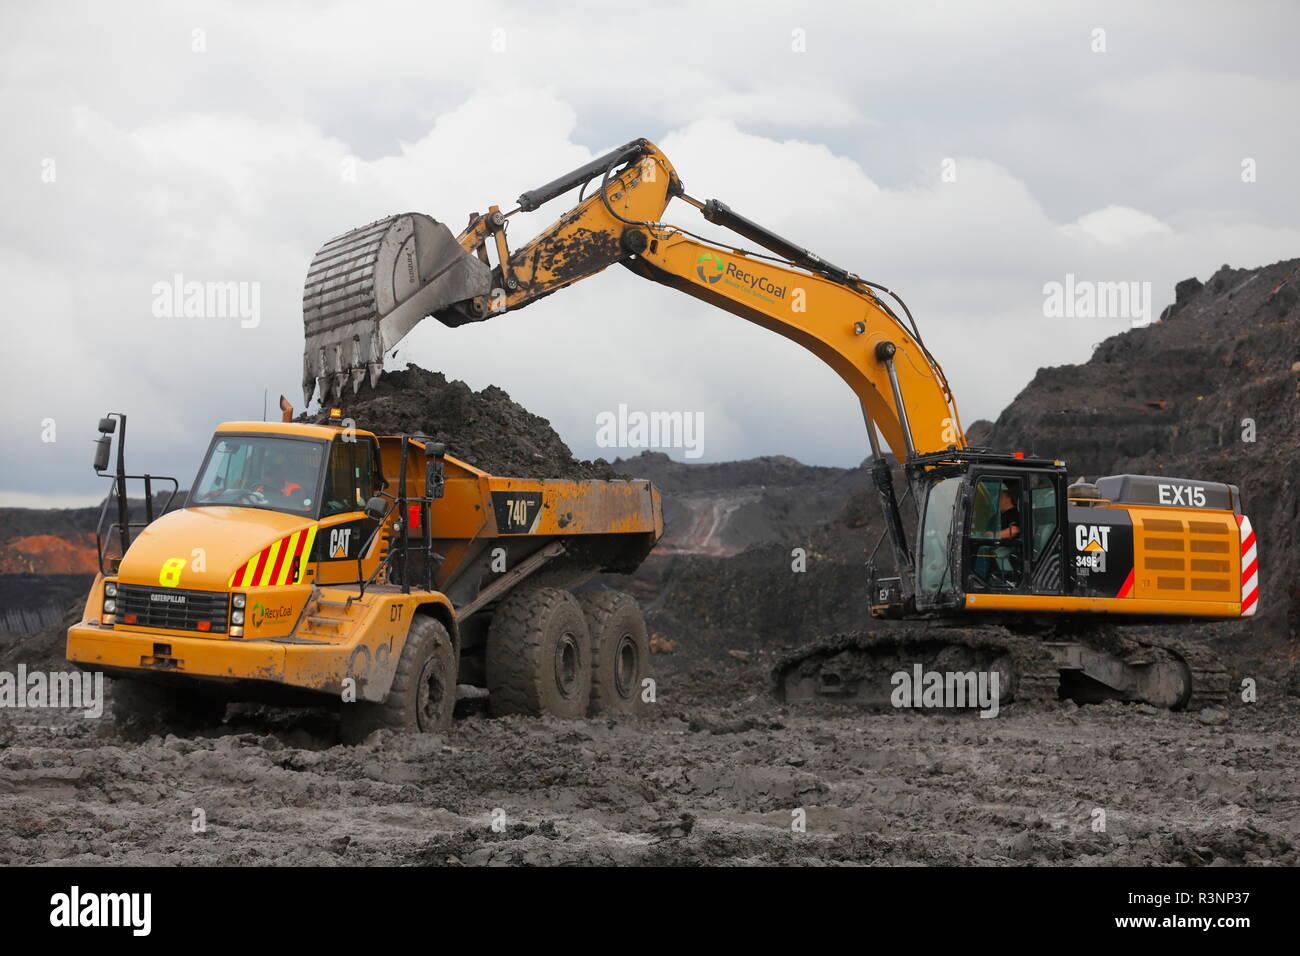 A Caterpillar 349E loading dump trucks on the Recycoal,Coal